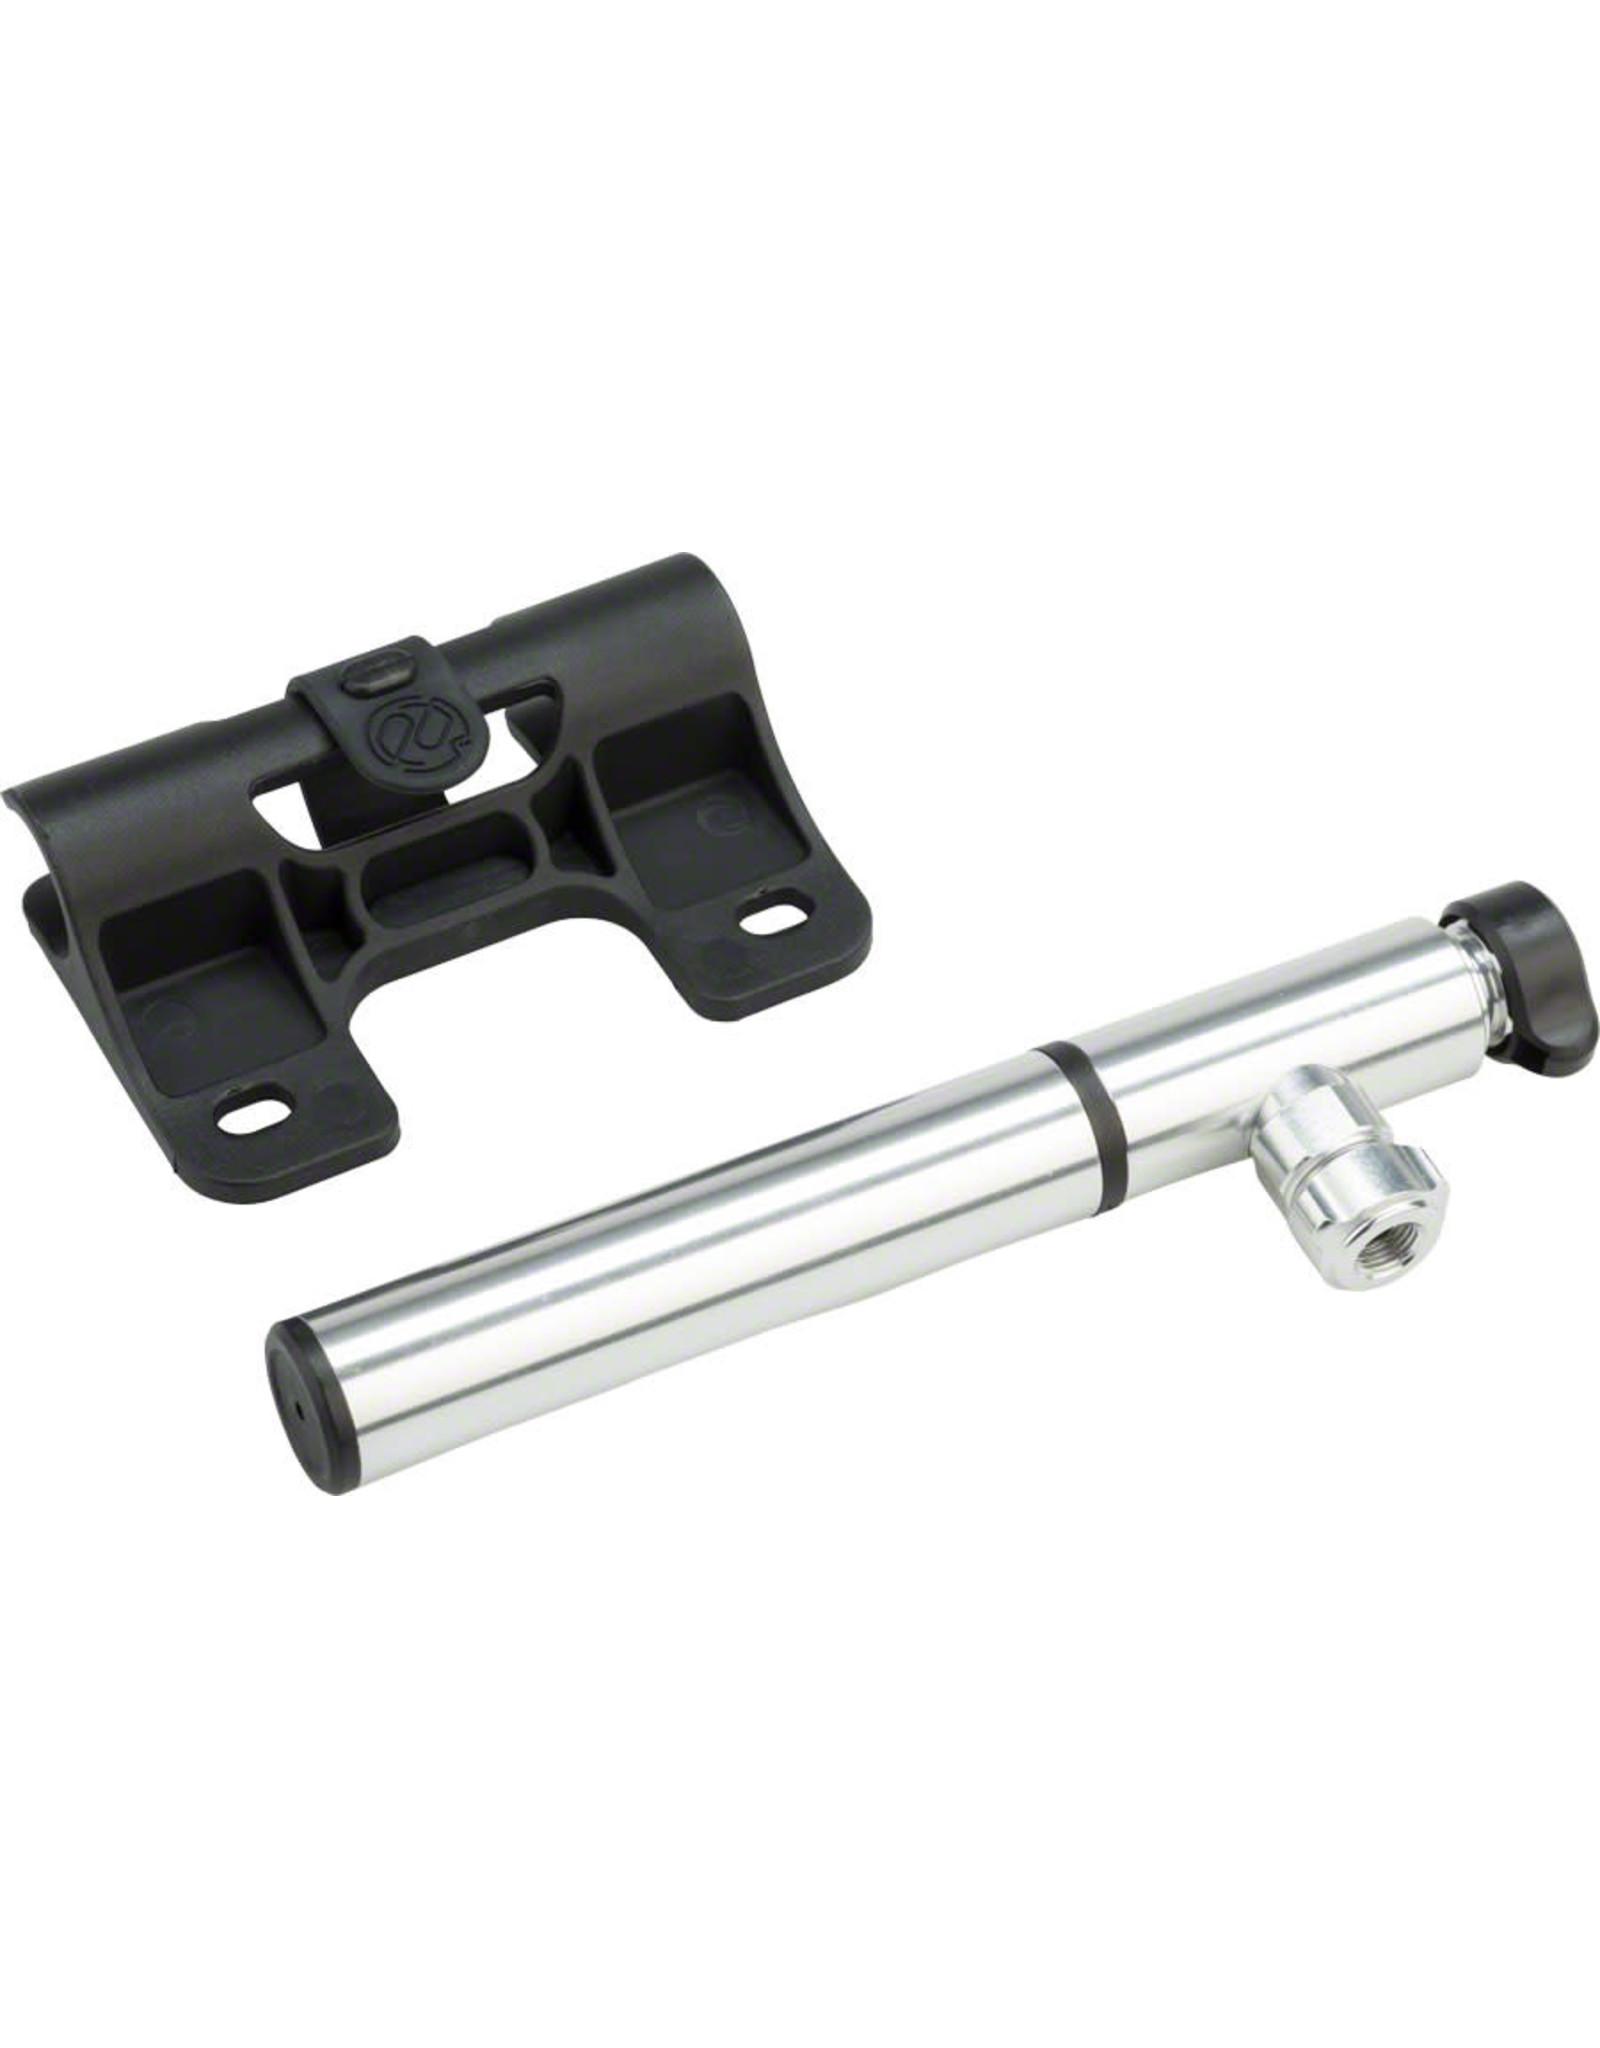 PDW Portland Design Works Ninja Pump and CO2 Inflator: Silver